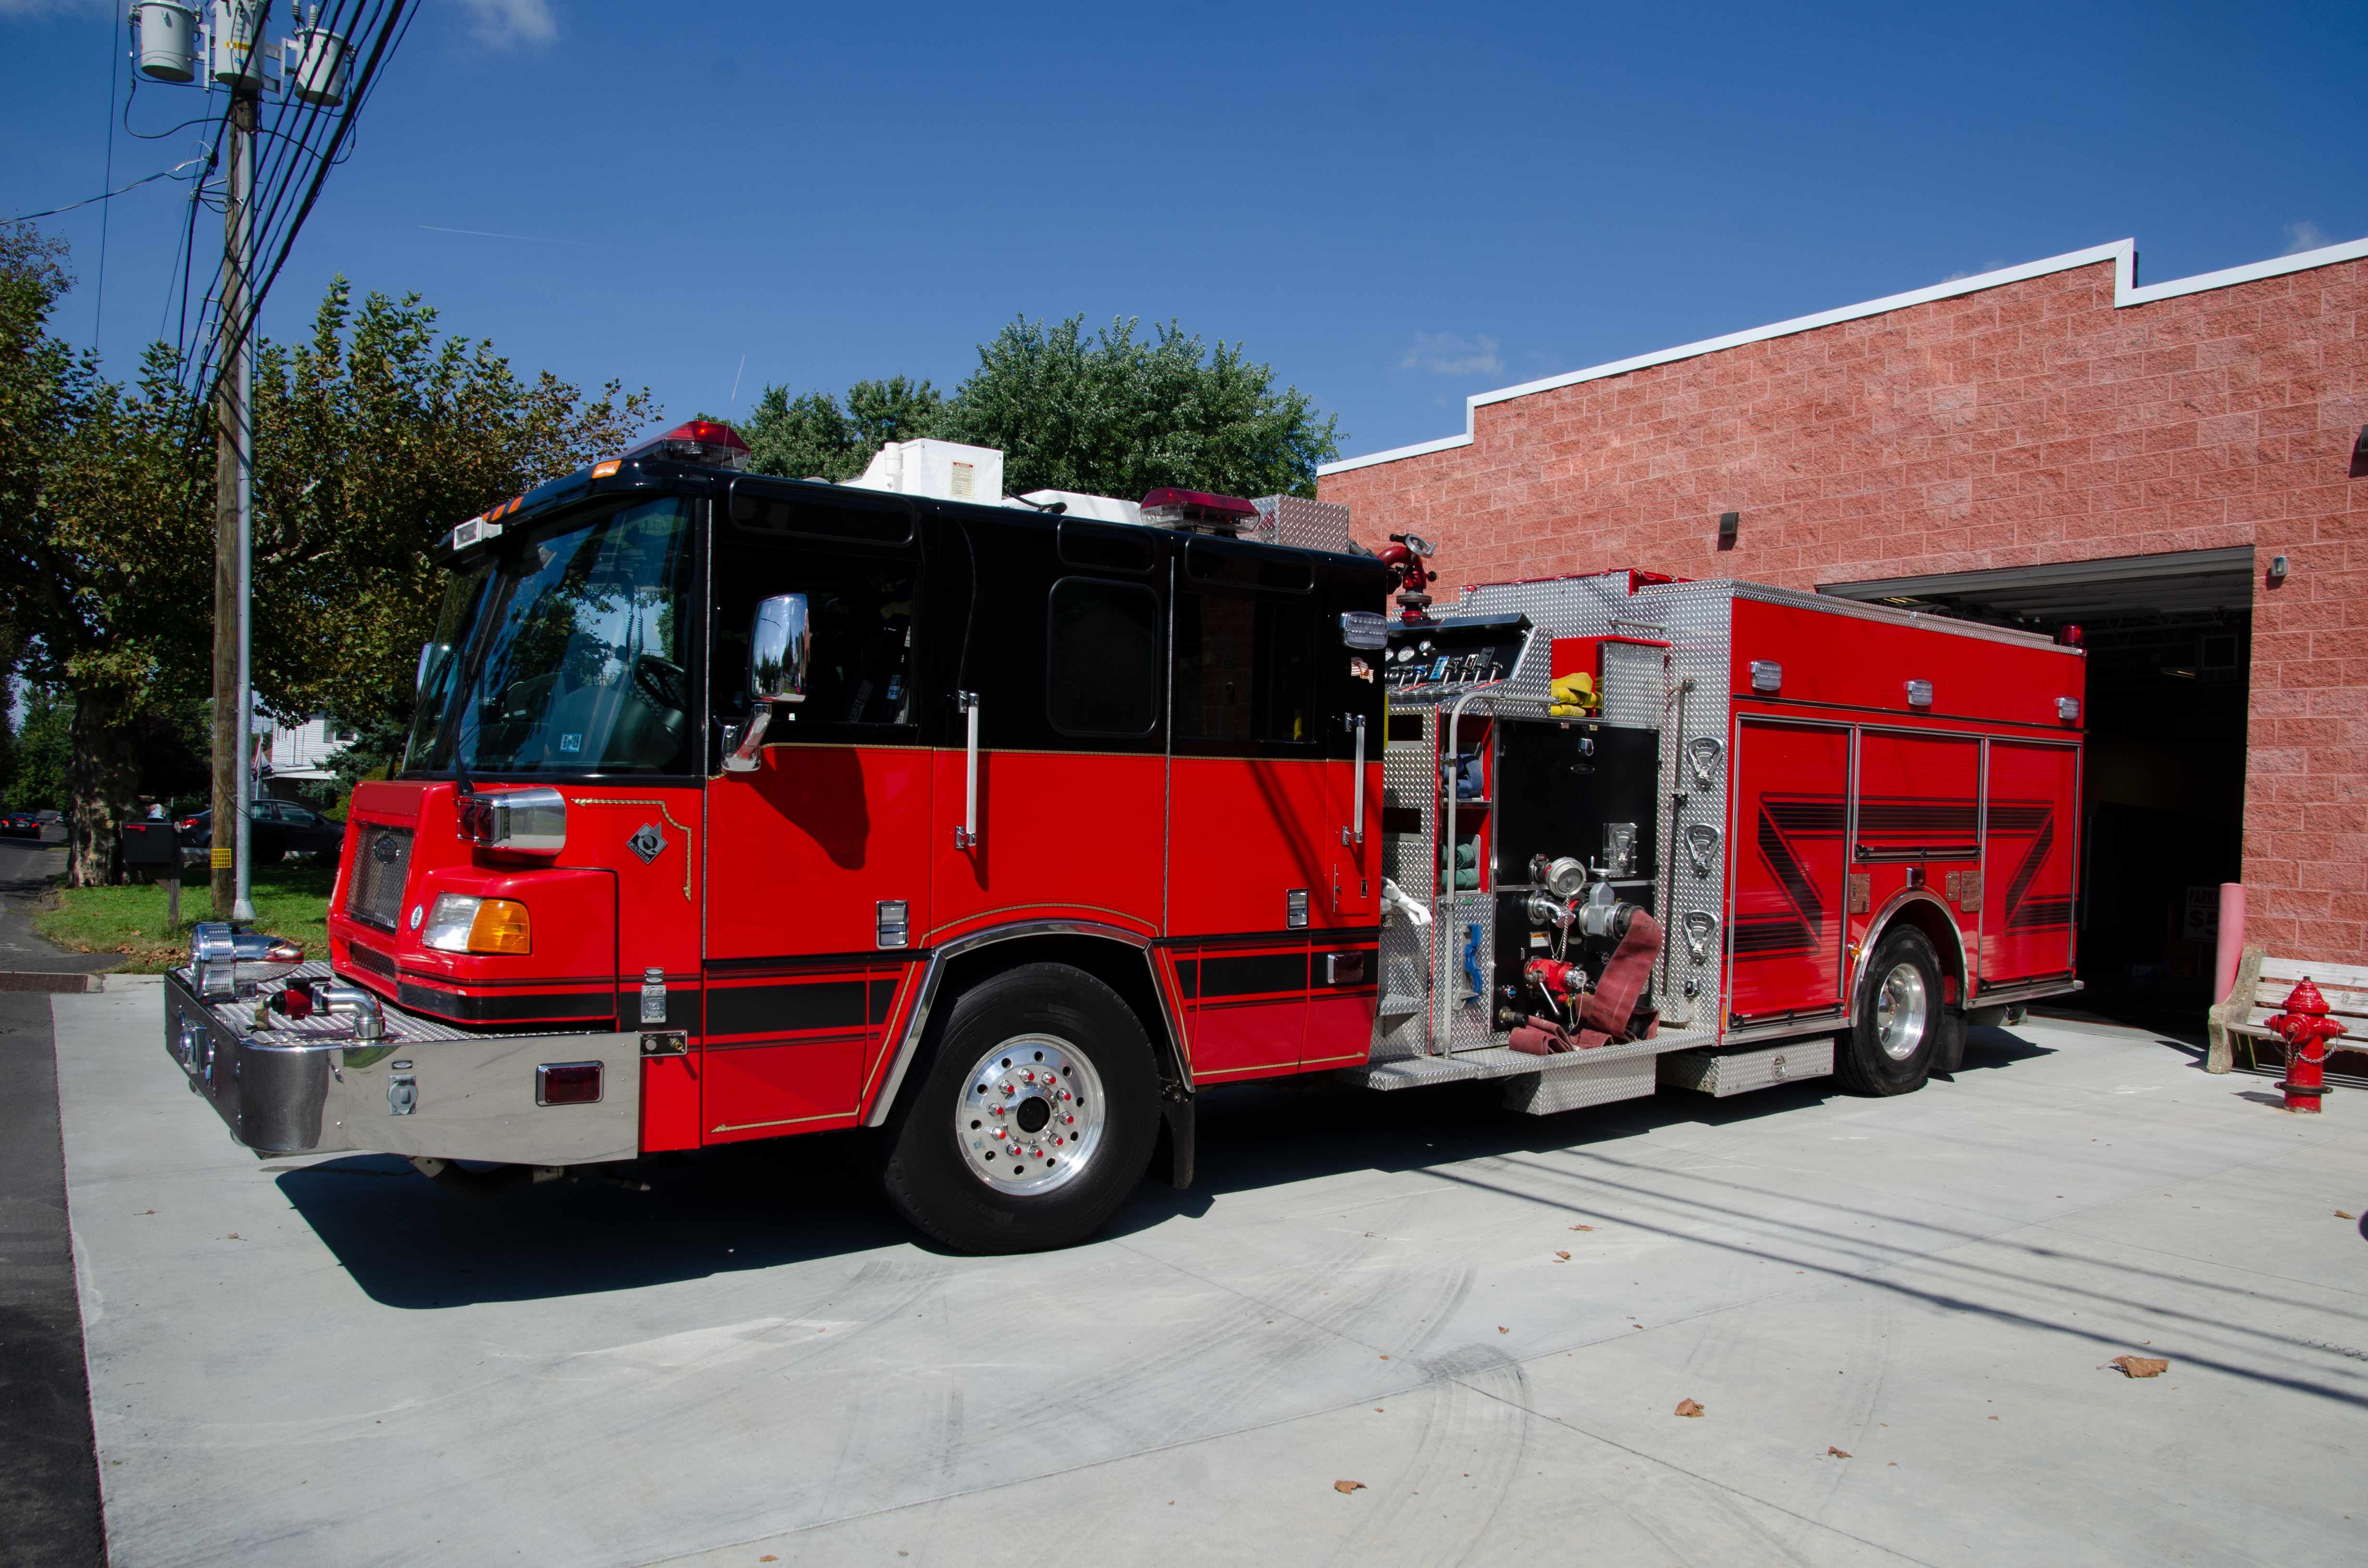 2002 Pierce Quantum Rescue Pumper | Used Truck Details